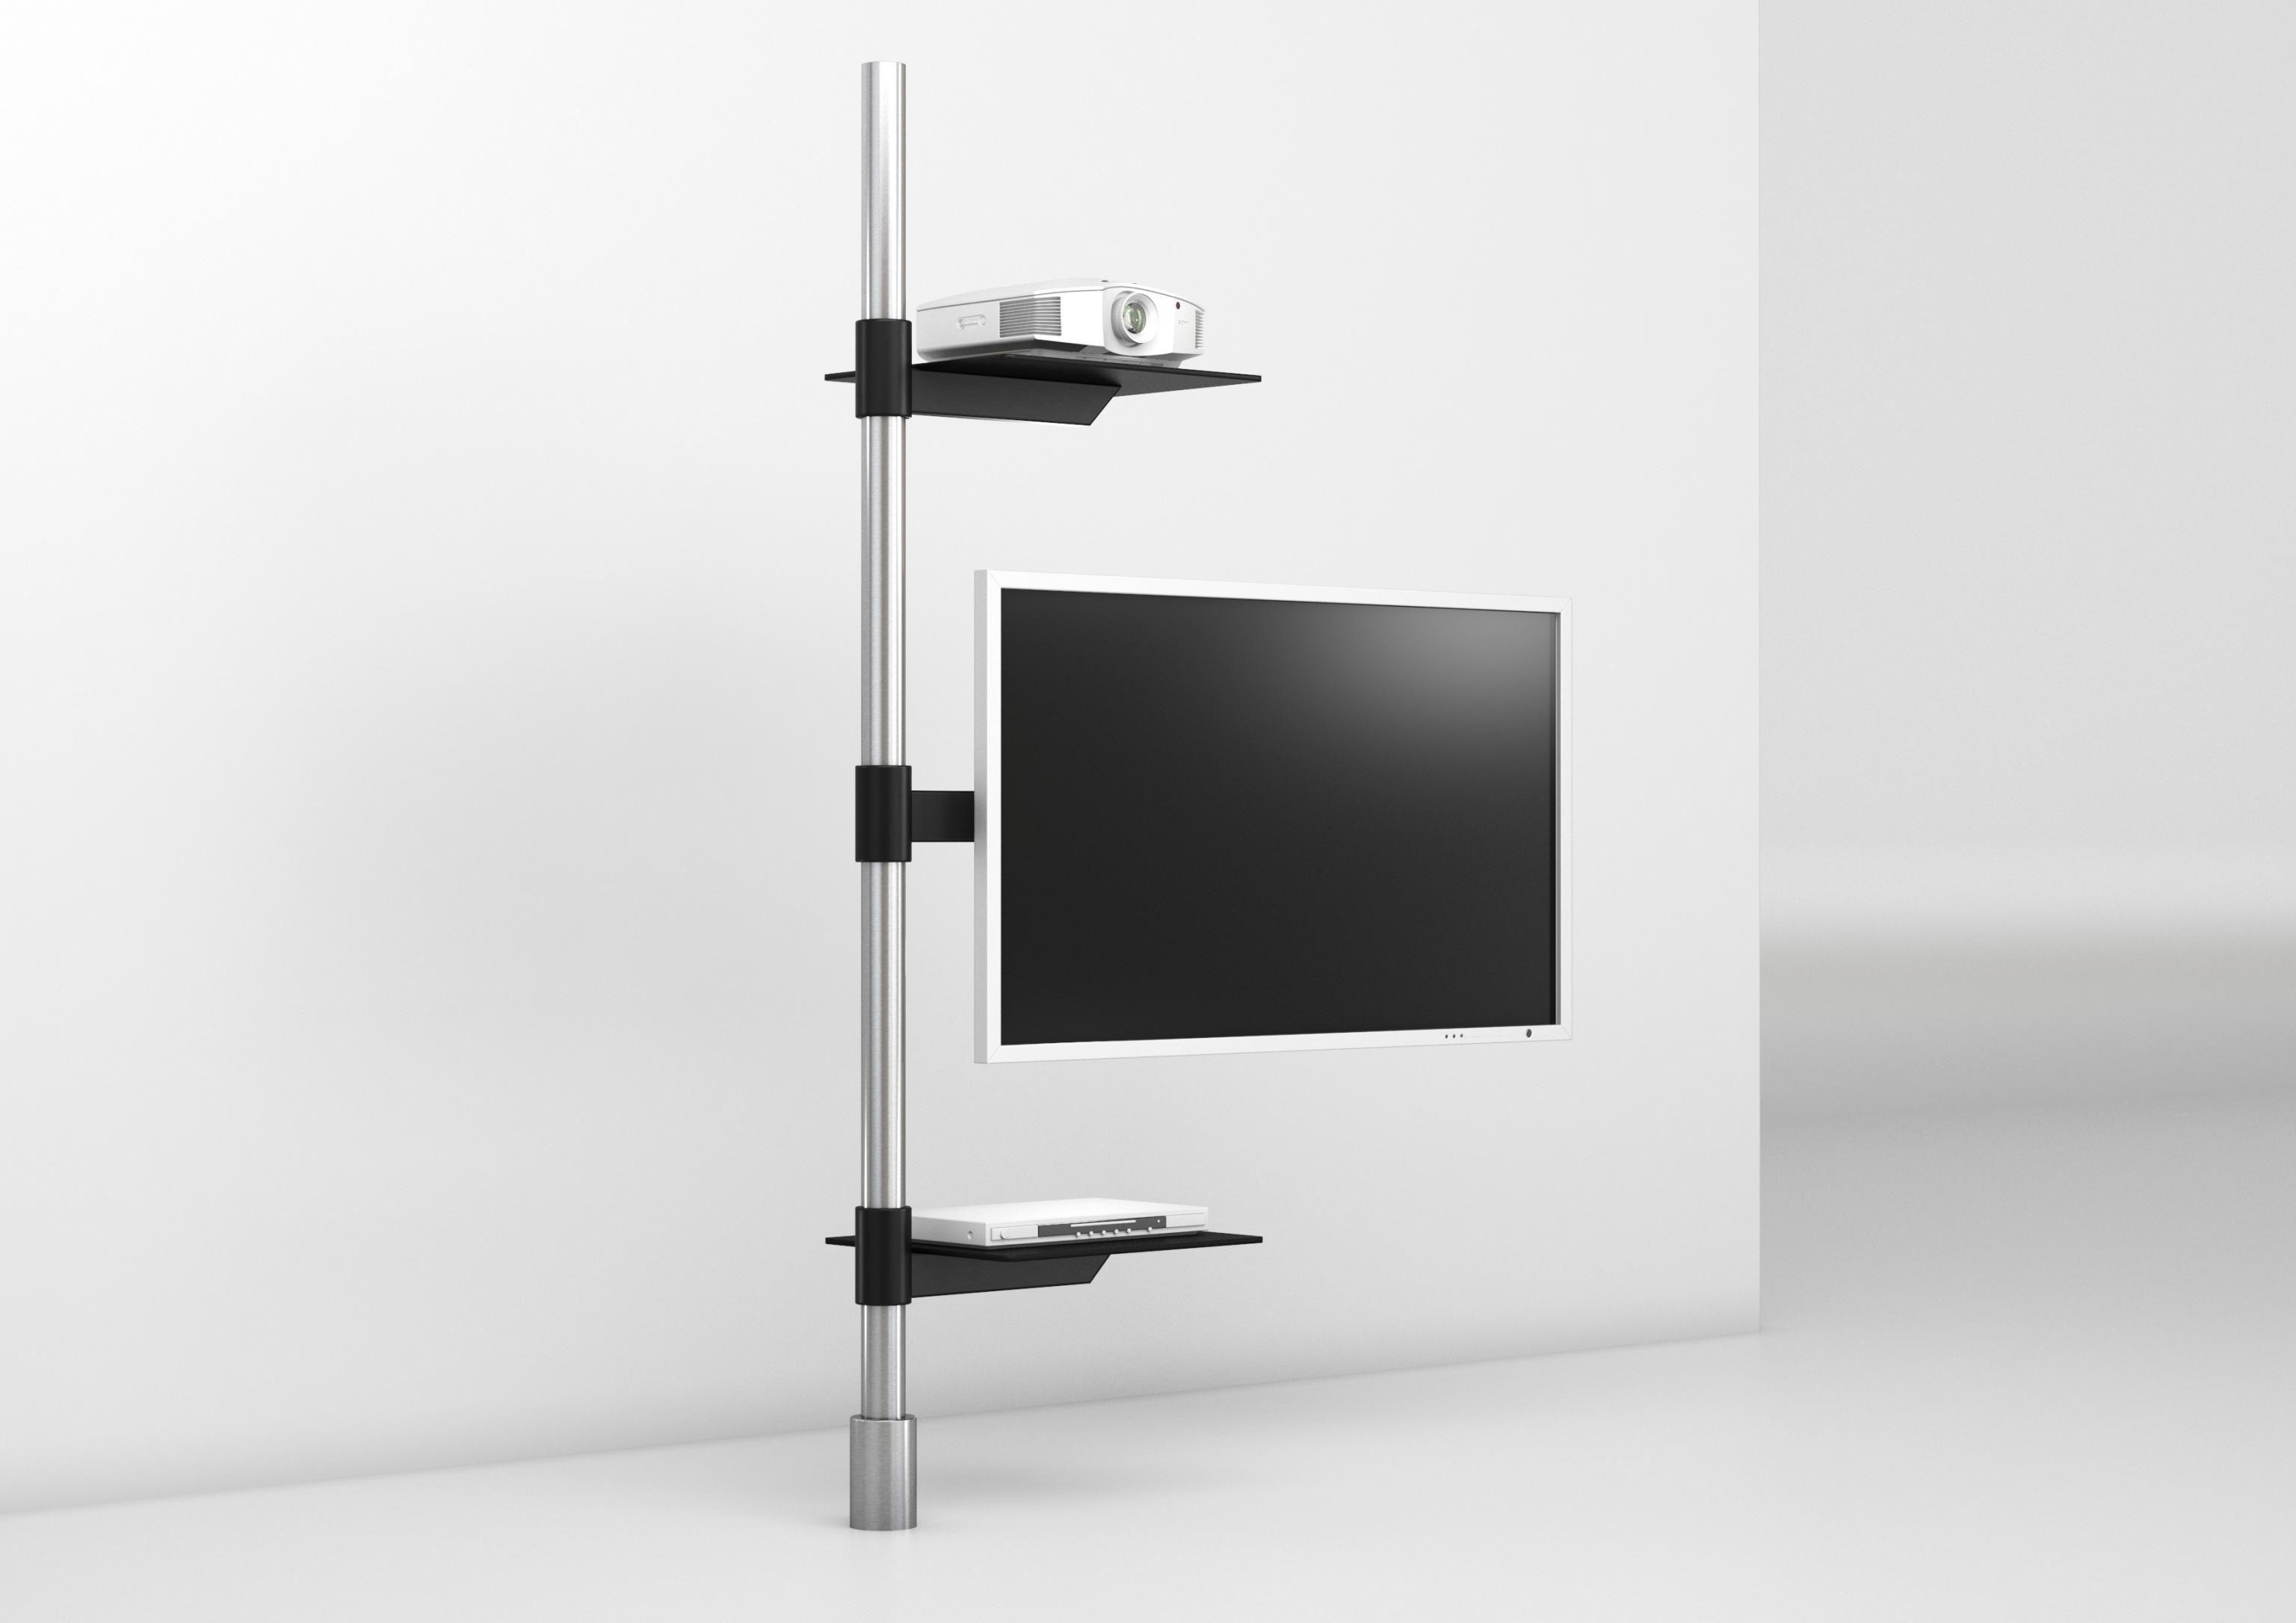 Tv Holder Post Art129 2 Product Design Wissmann Raumobjekte